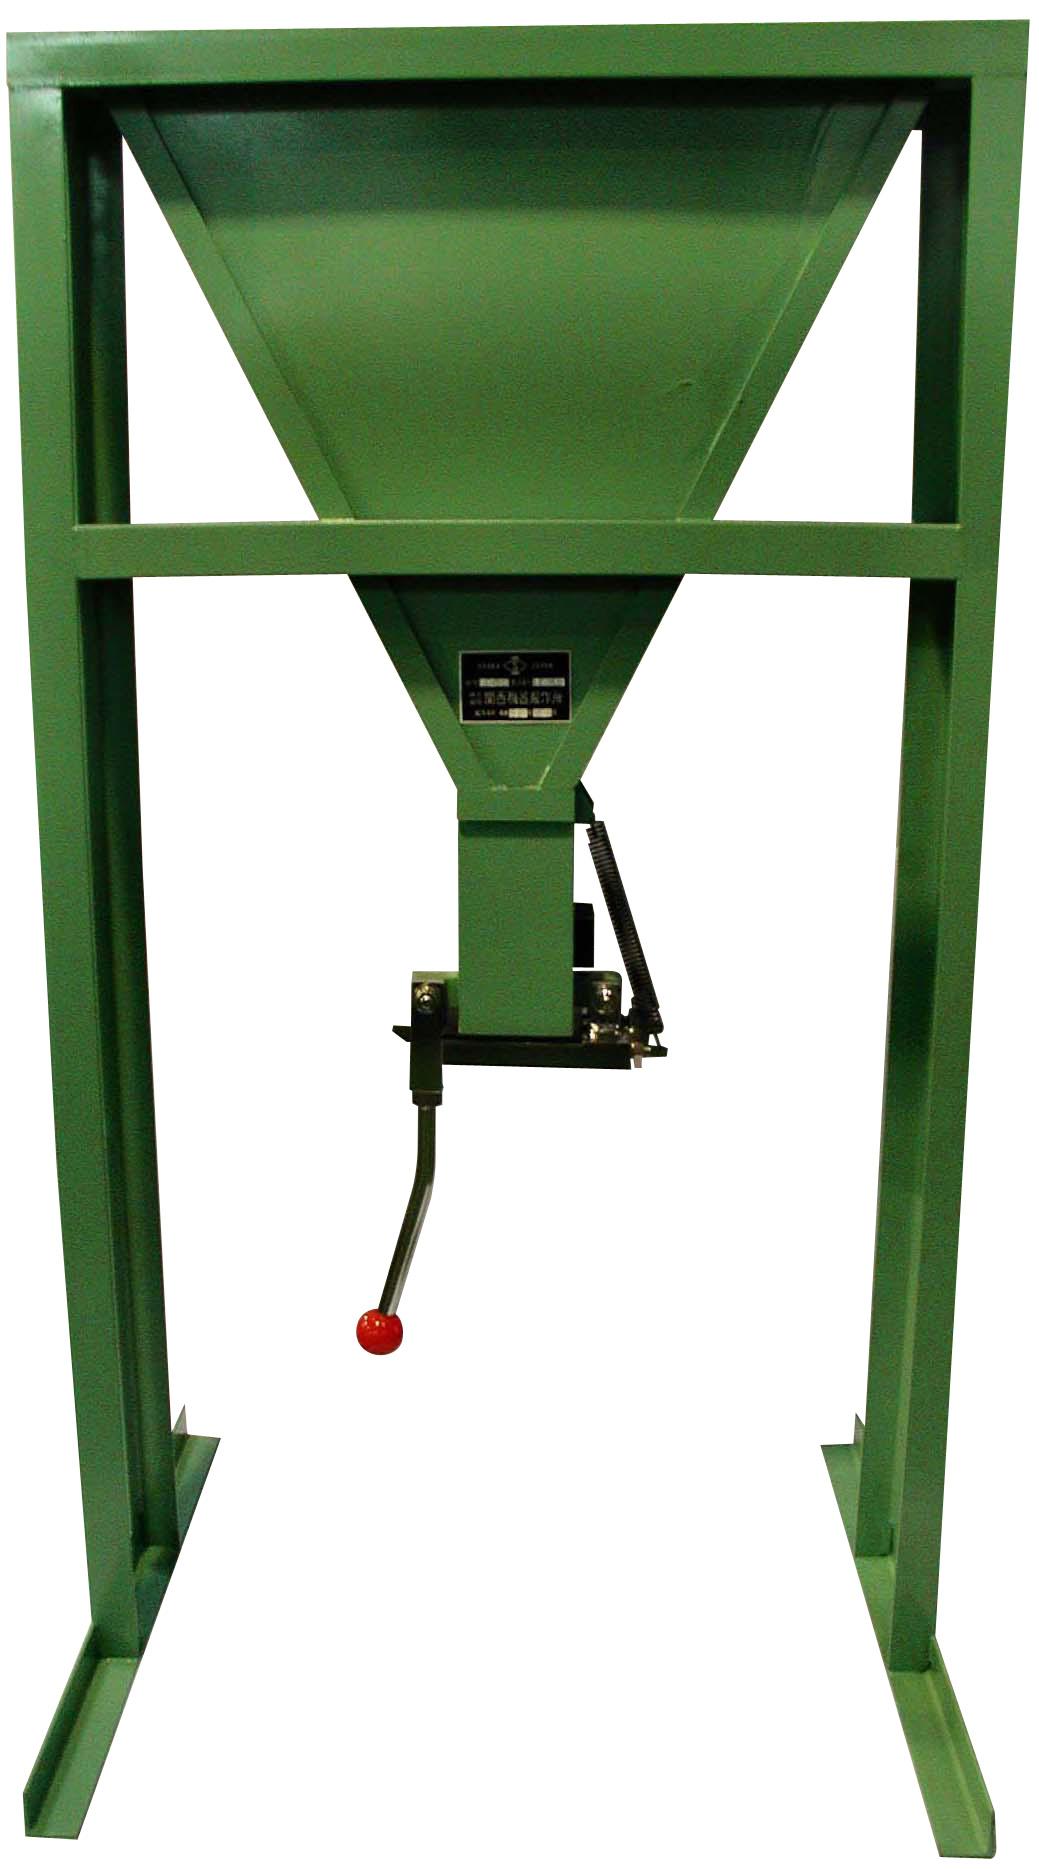 V型ロート試験装置 A:吐出口 65mmx75mm B:75mmx75mm